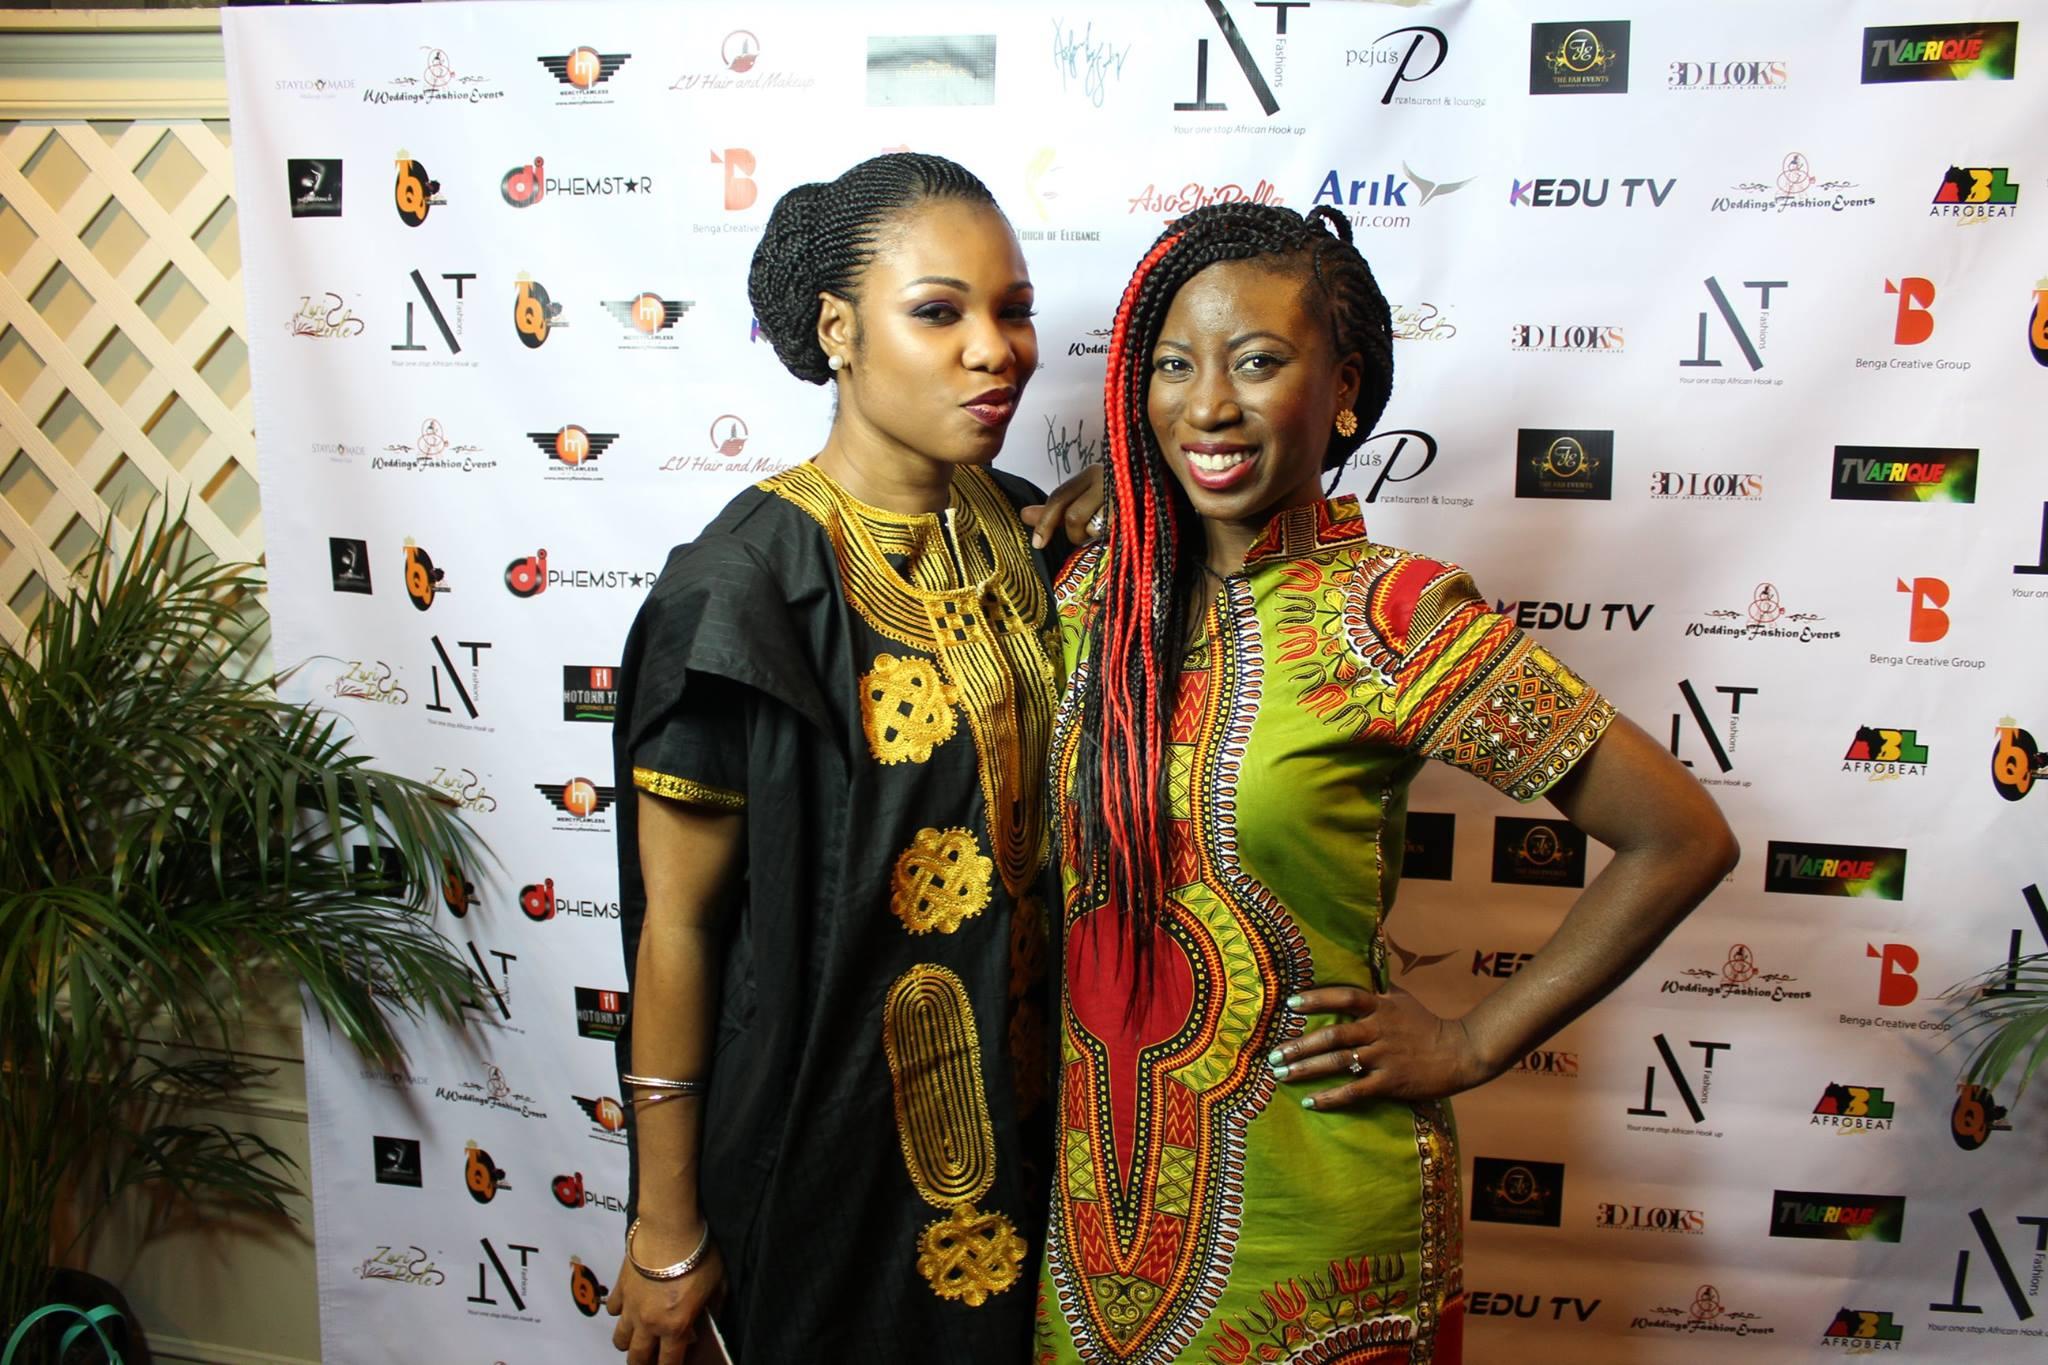 tolumide_bunmi-adenugba-tnt-tynt-fashion-designer-afr